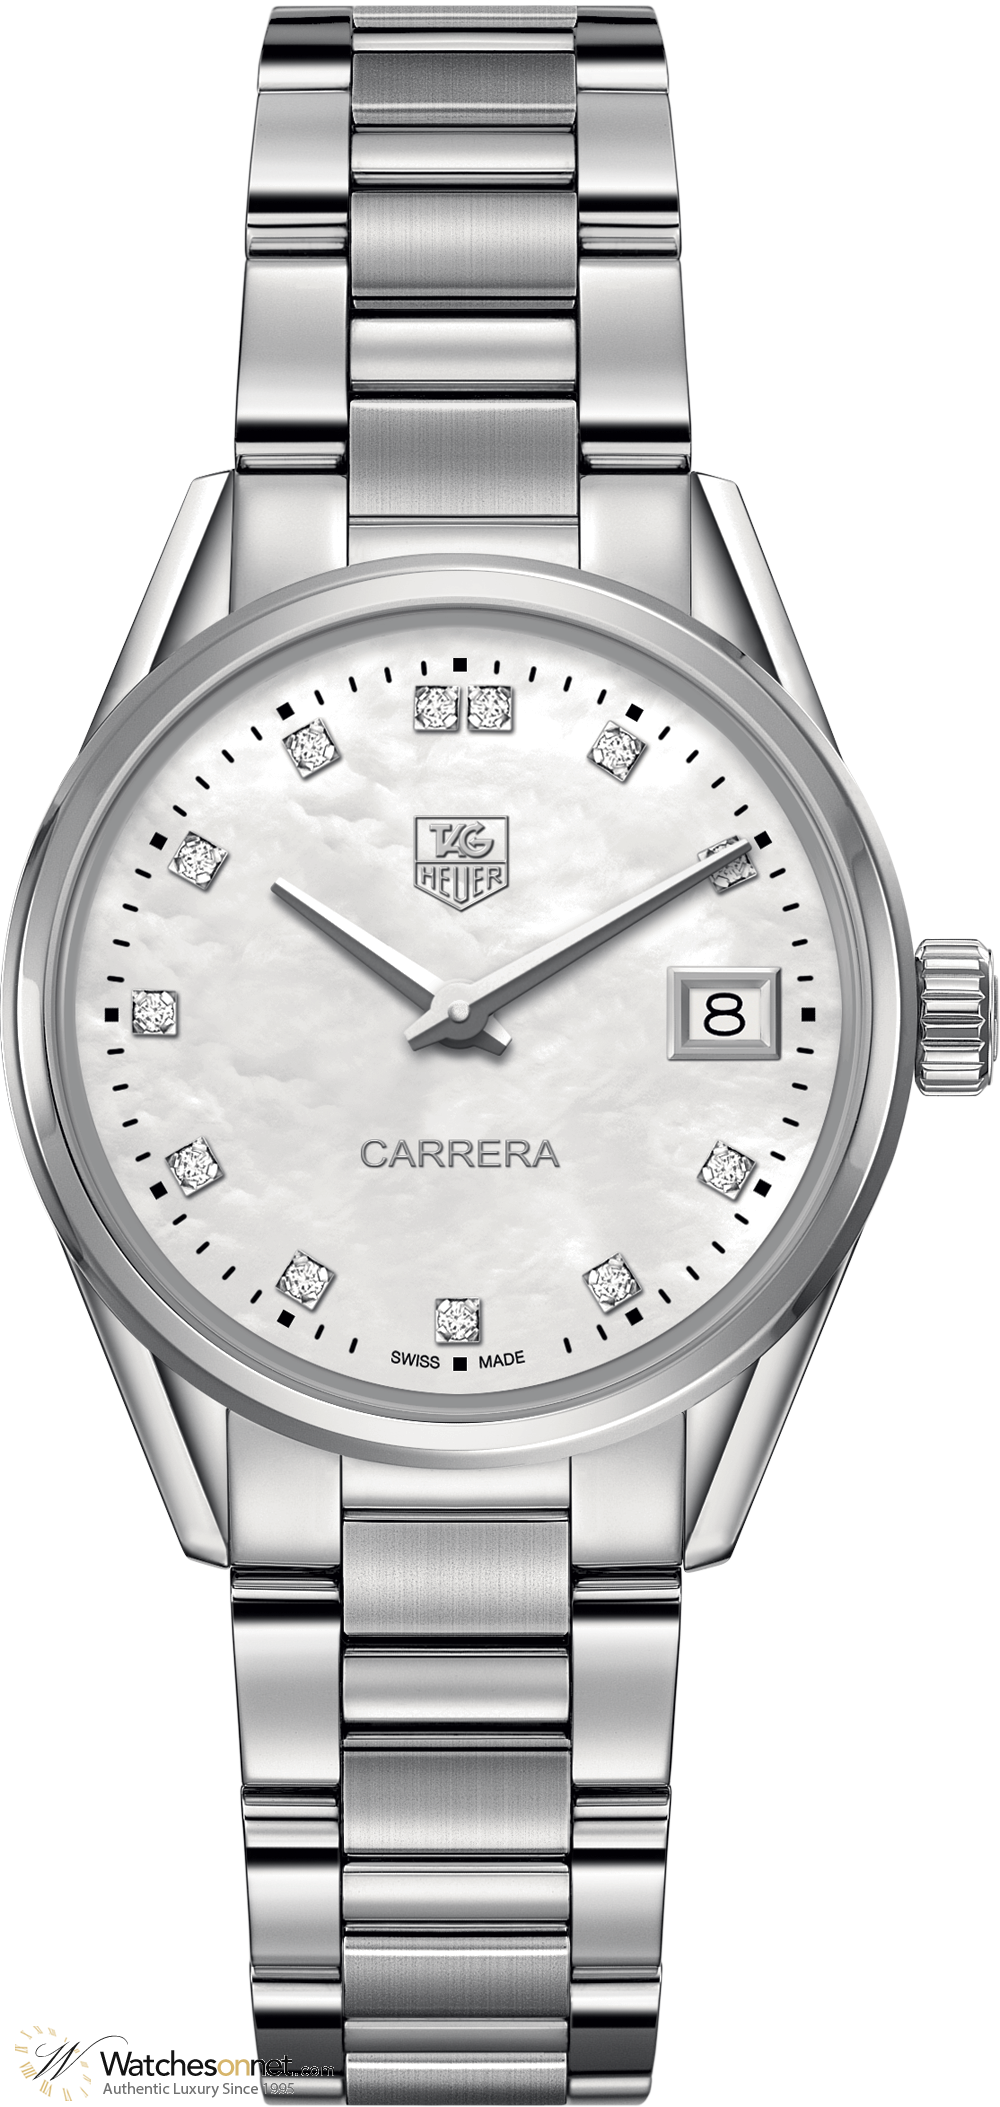 Часы tag heuer carrera женские цена